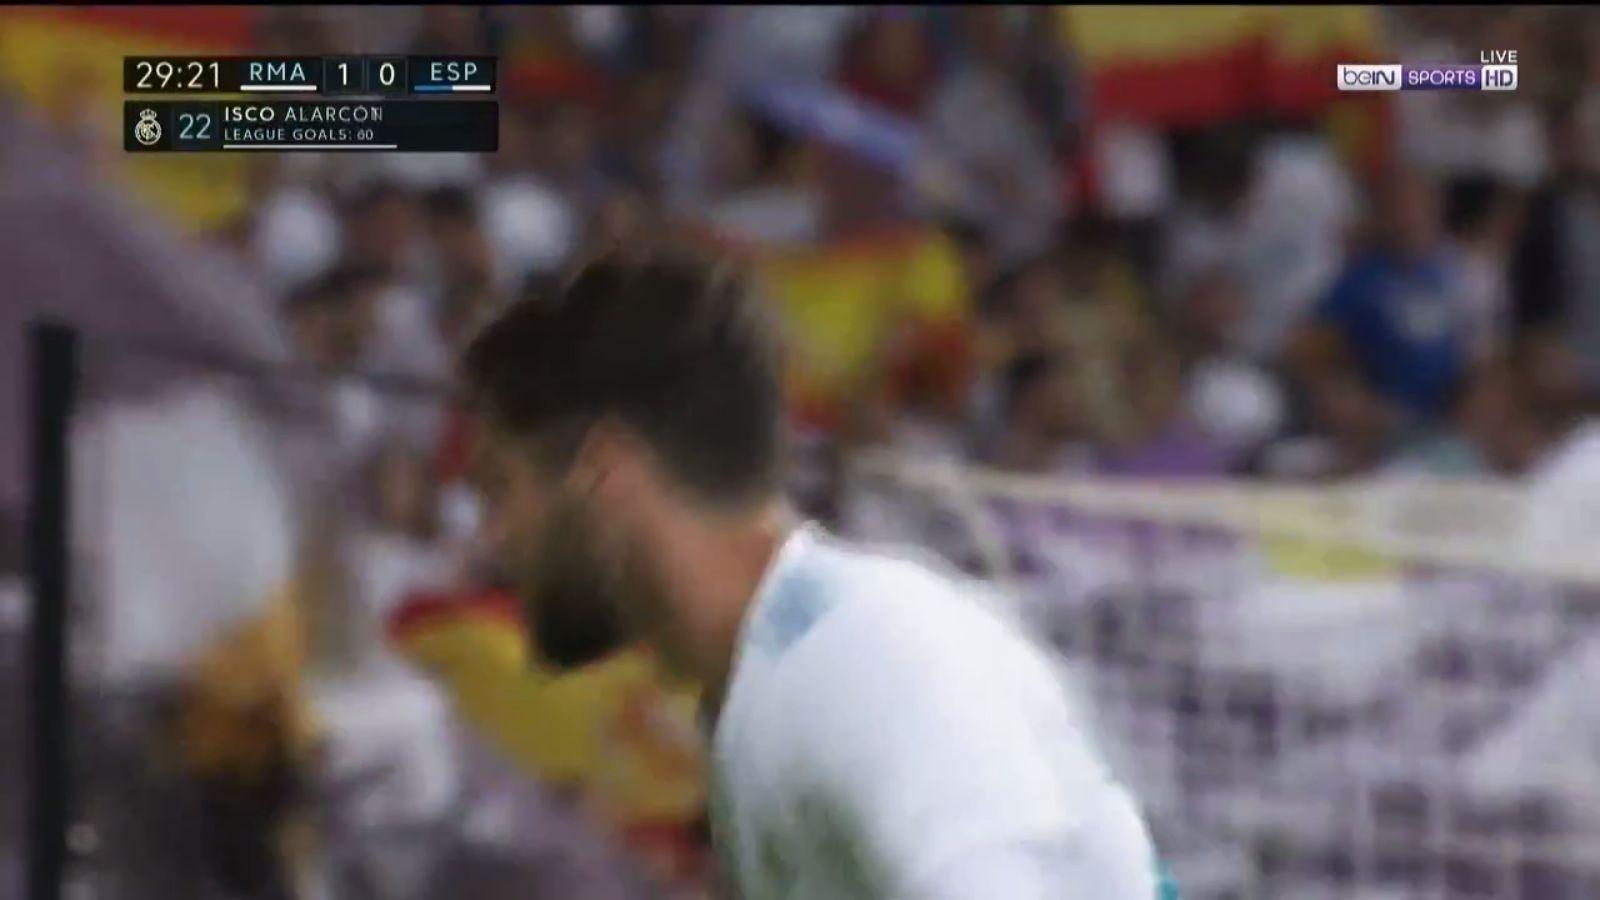 01-10-2017 - Real Madrid 2-0 Espanyol